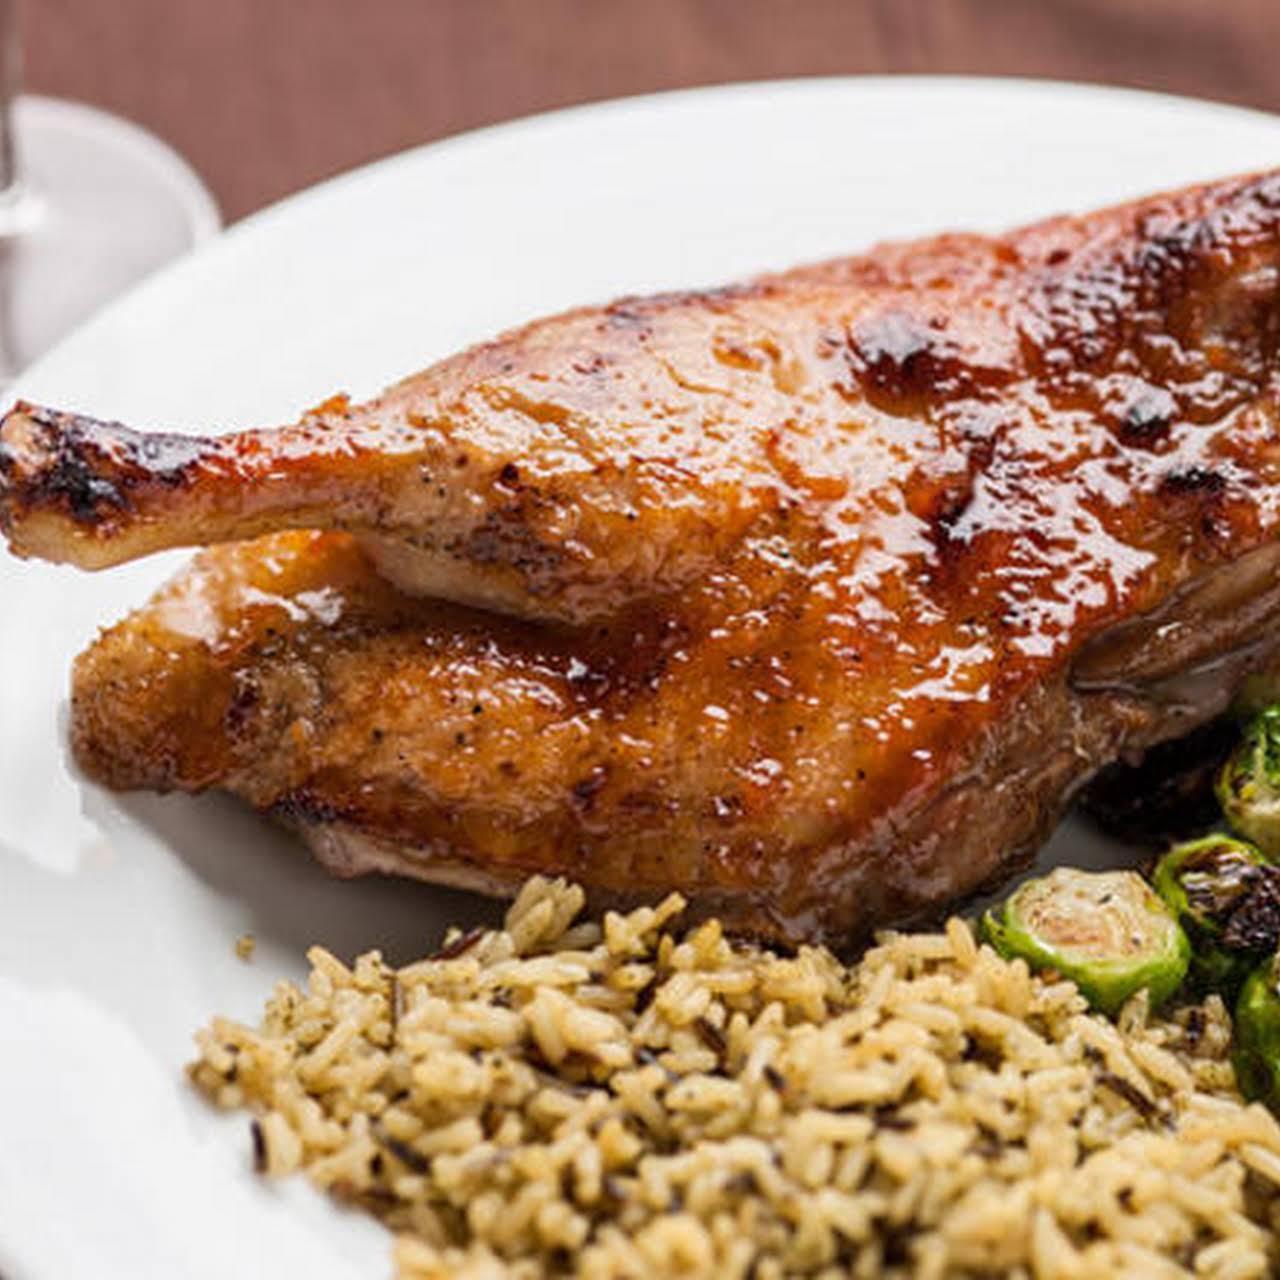 Marmalade-Glazed Roast Duck